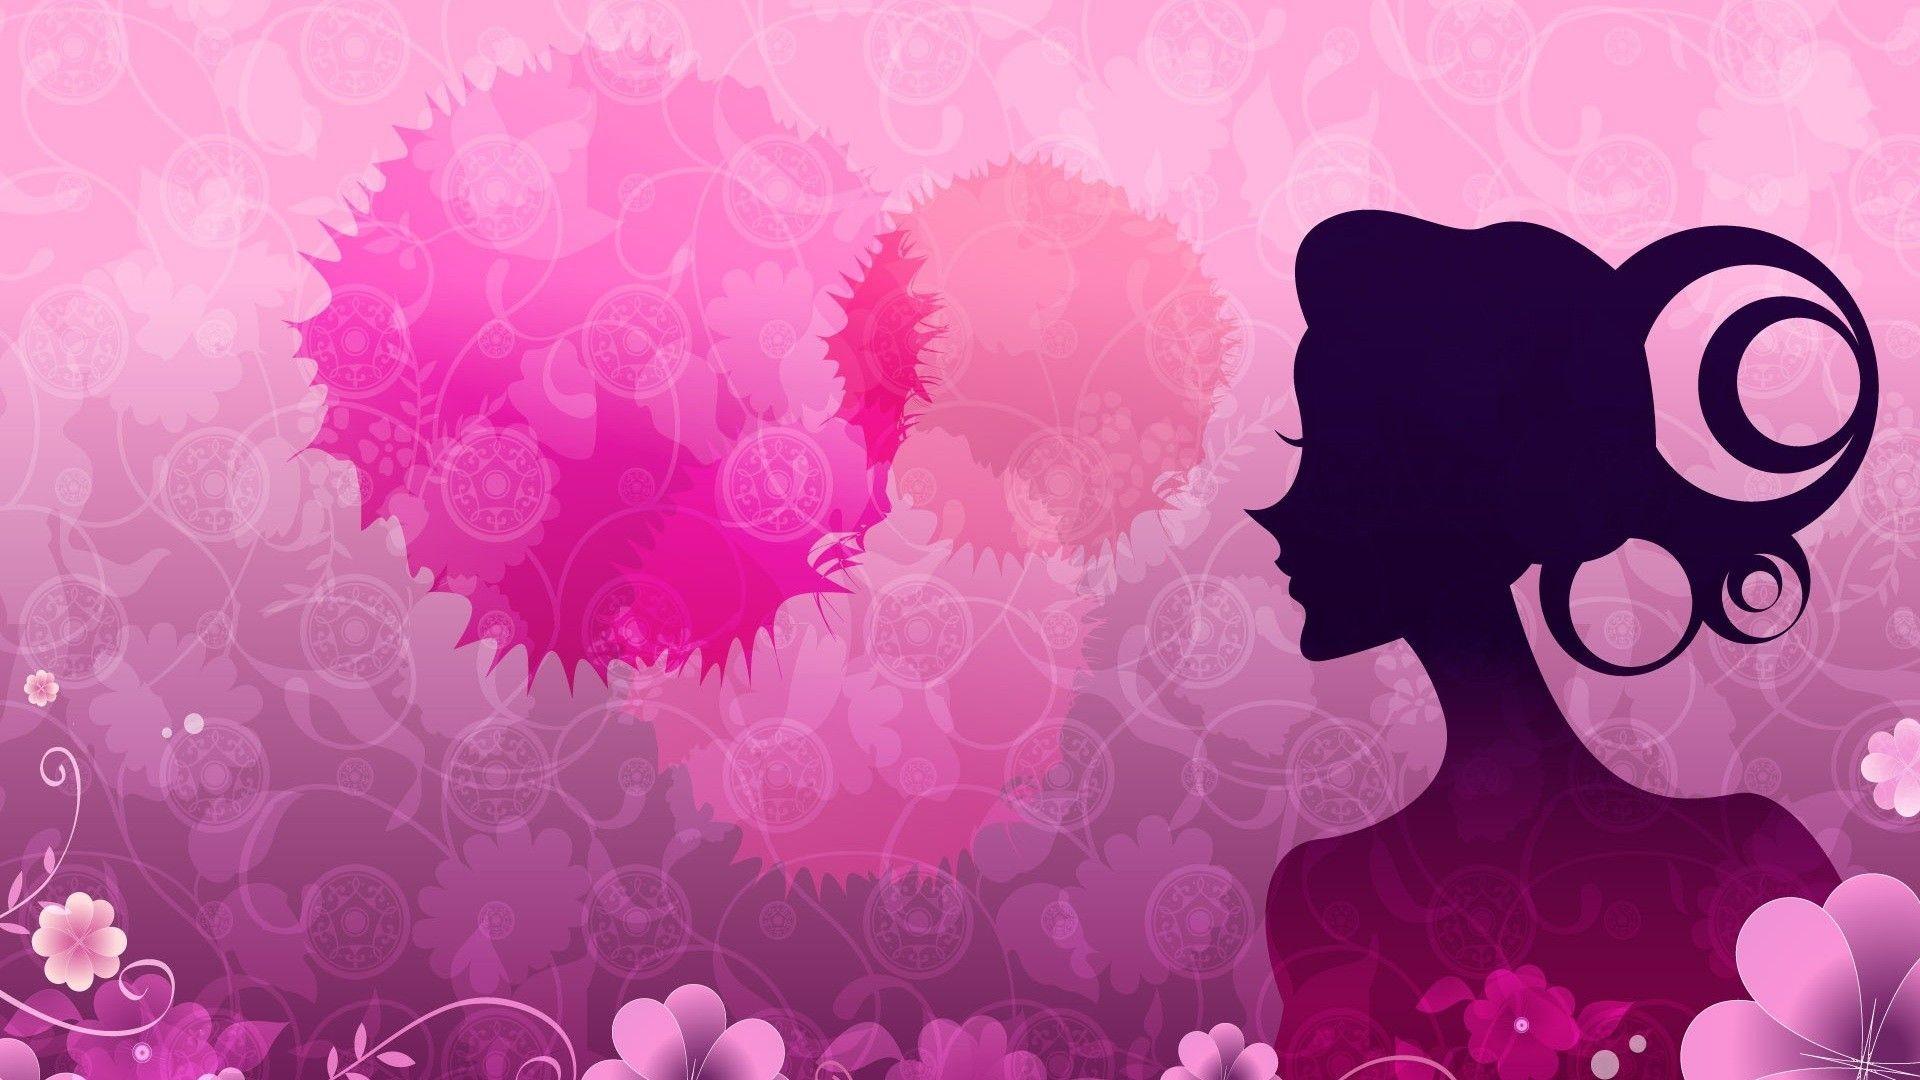 International Women's Day wallpaper